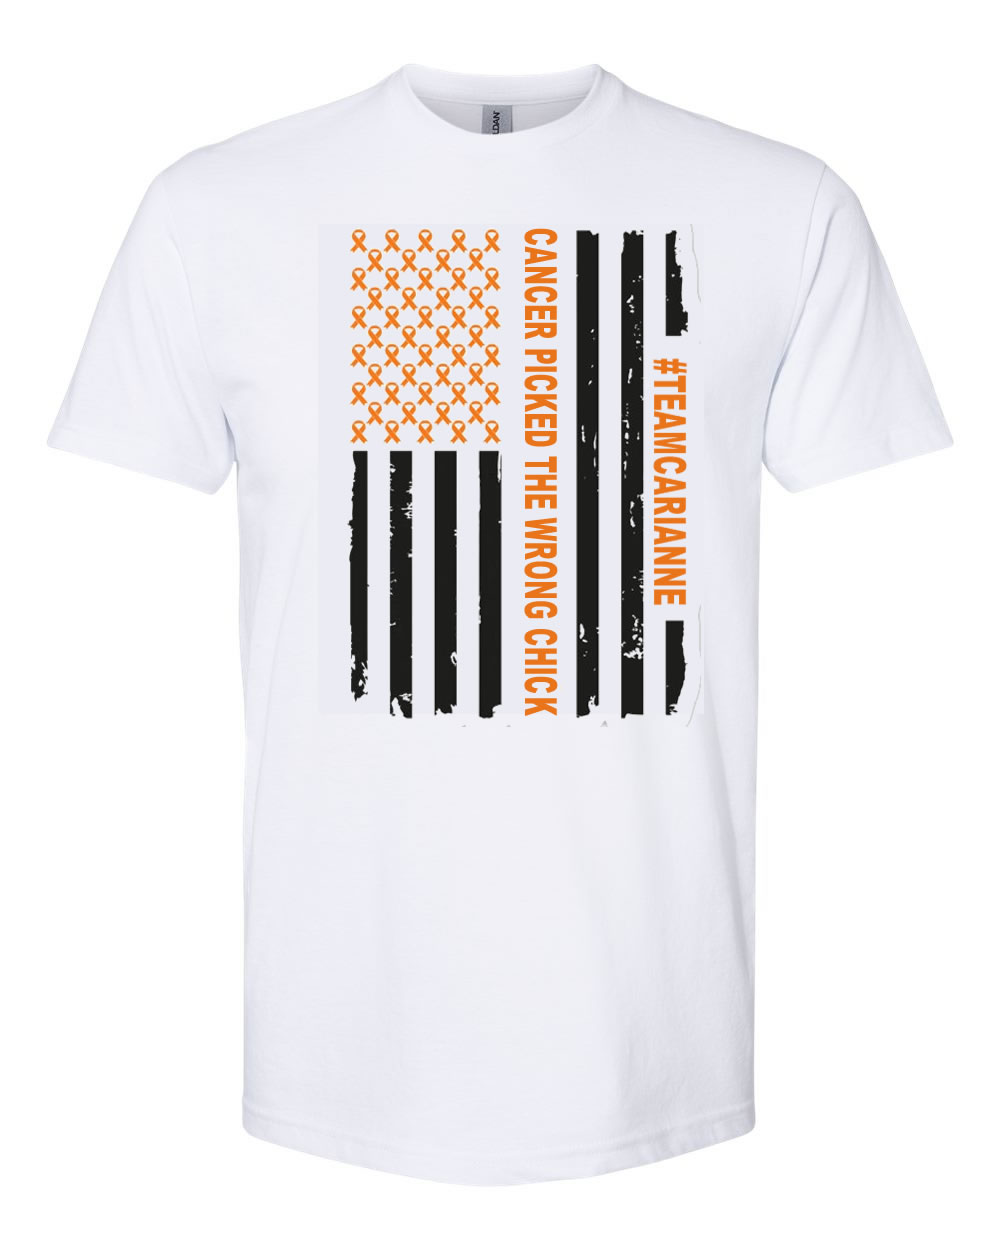 #TeamCarianne Leukemia T-Shirts